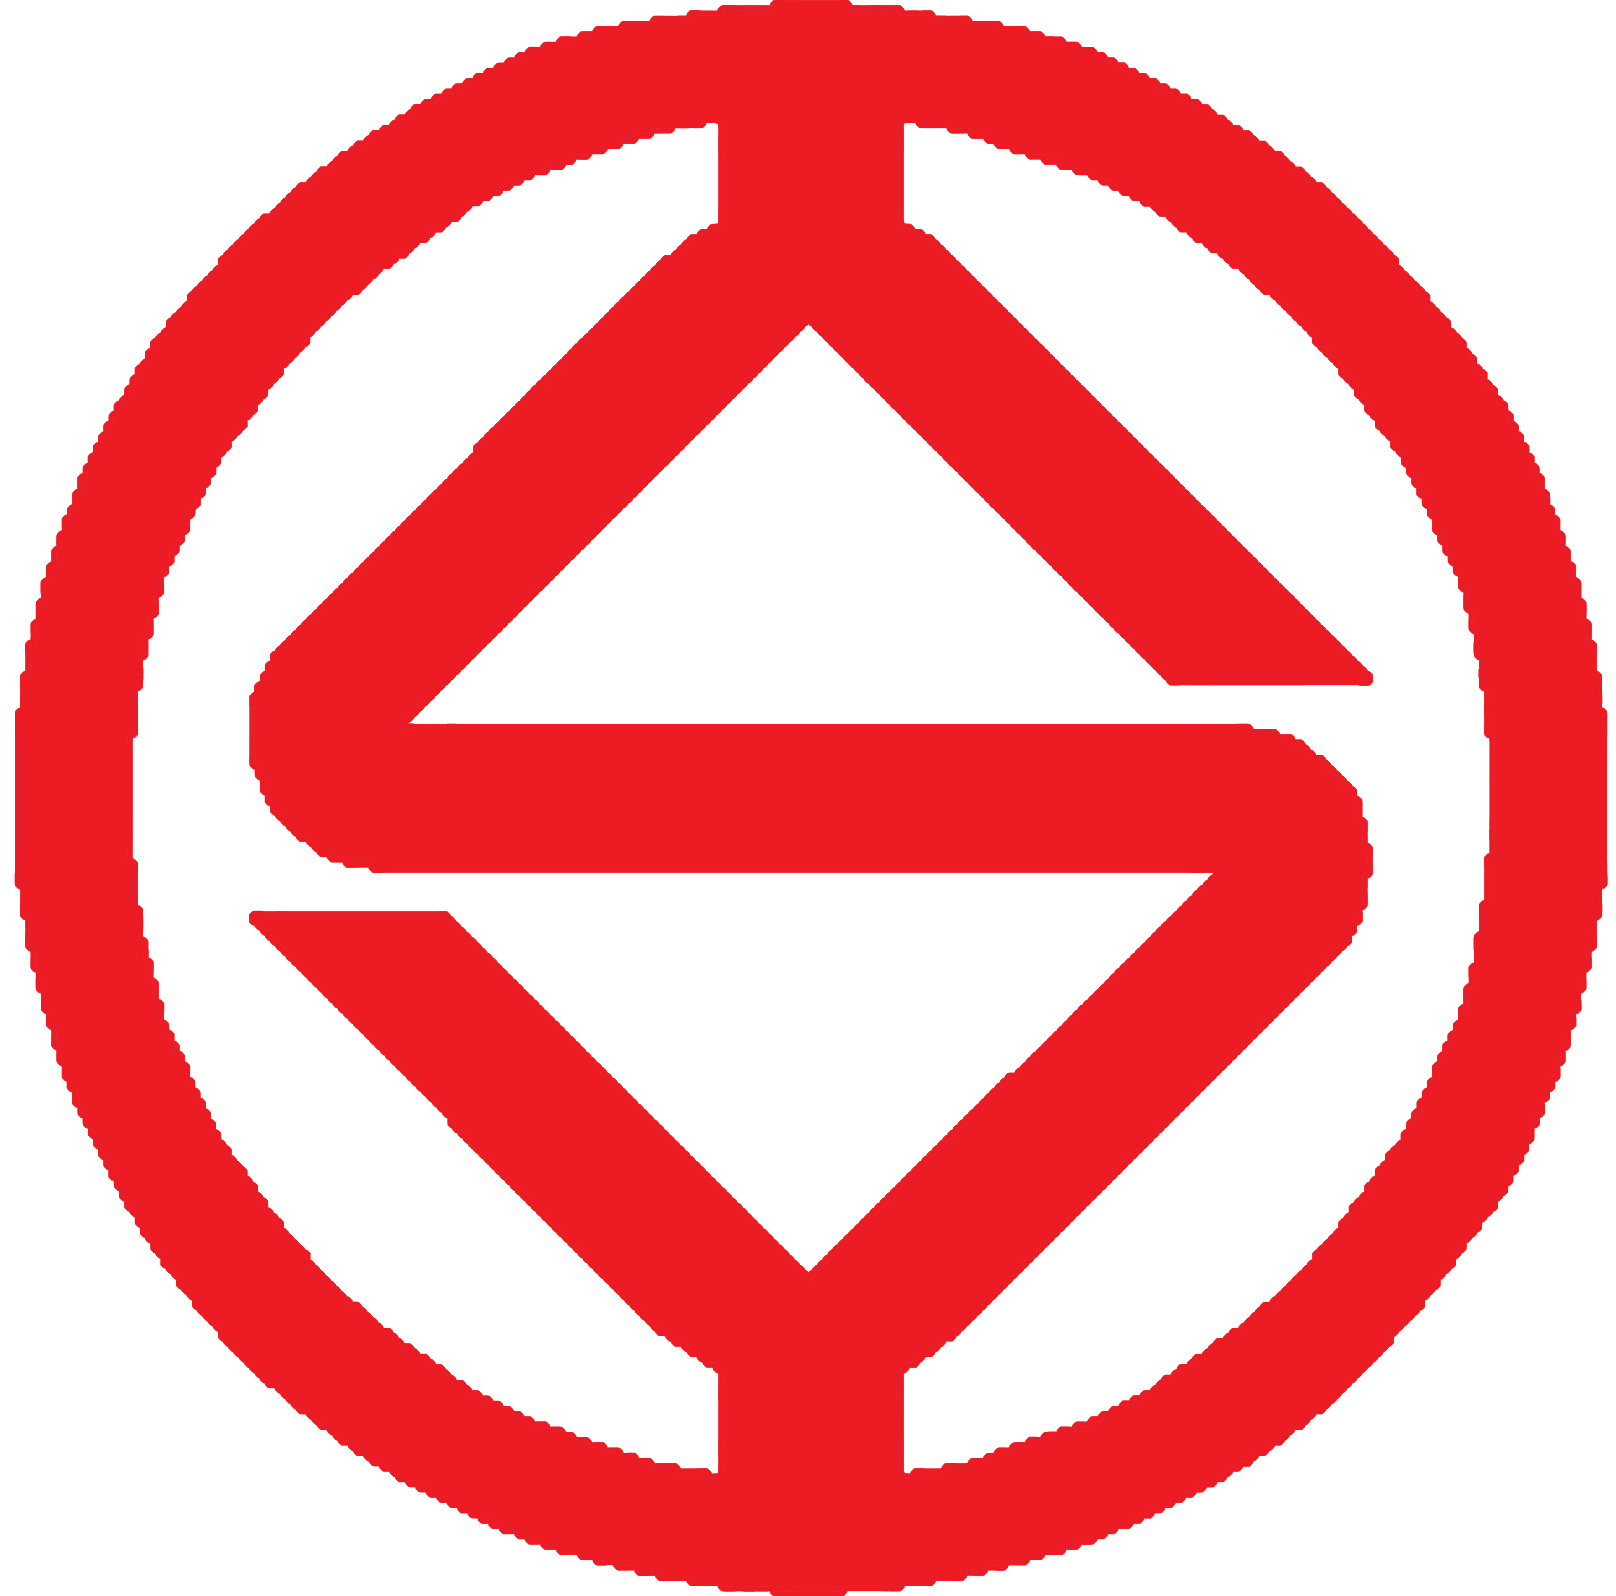 logo 标识 标志 设计 图标 1616_1596